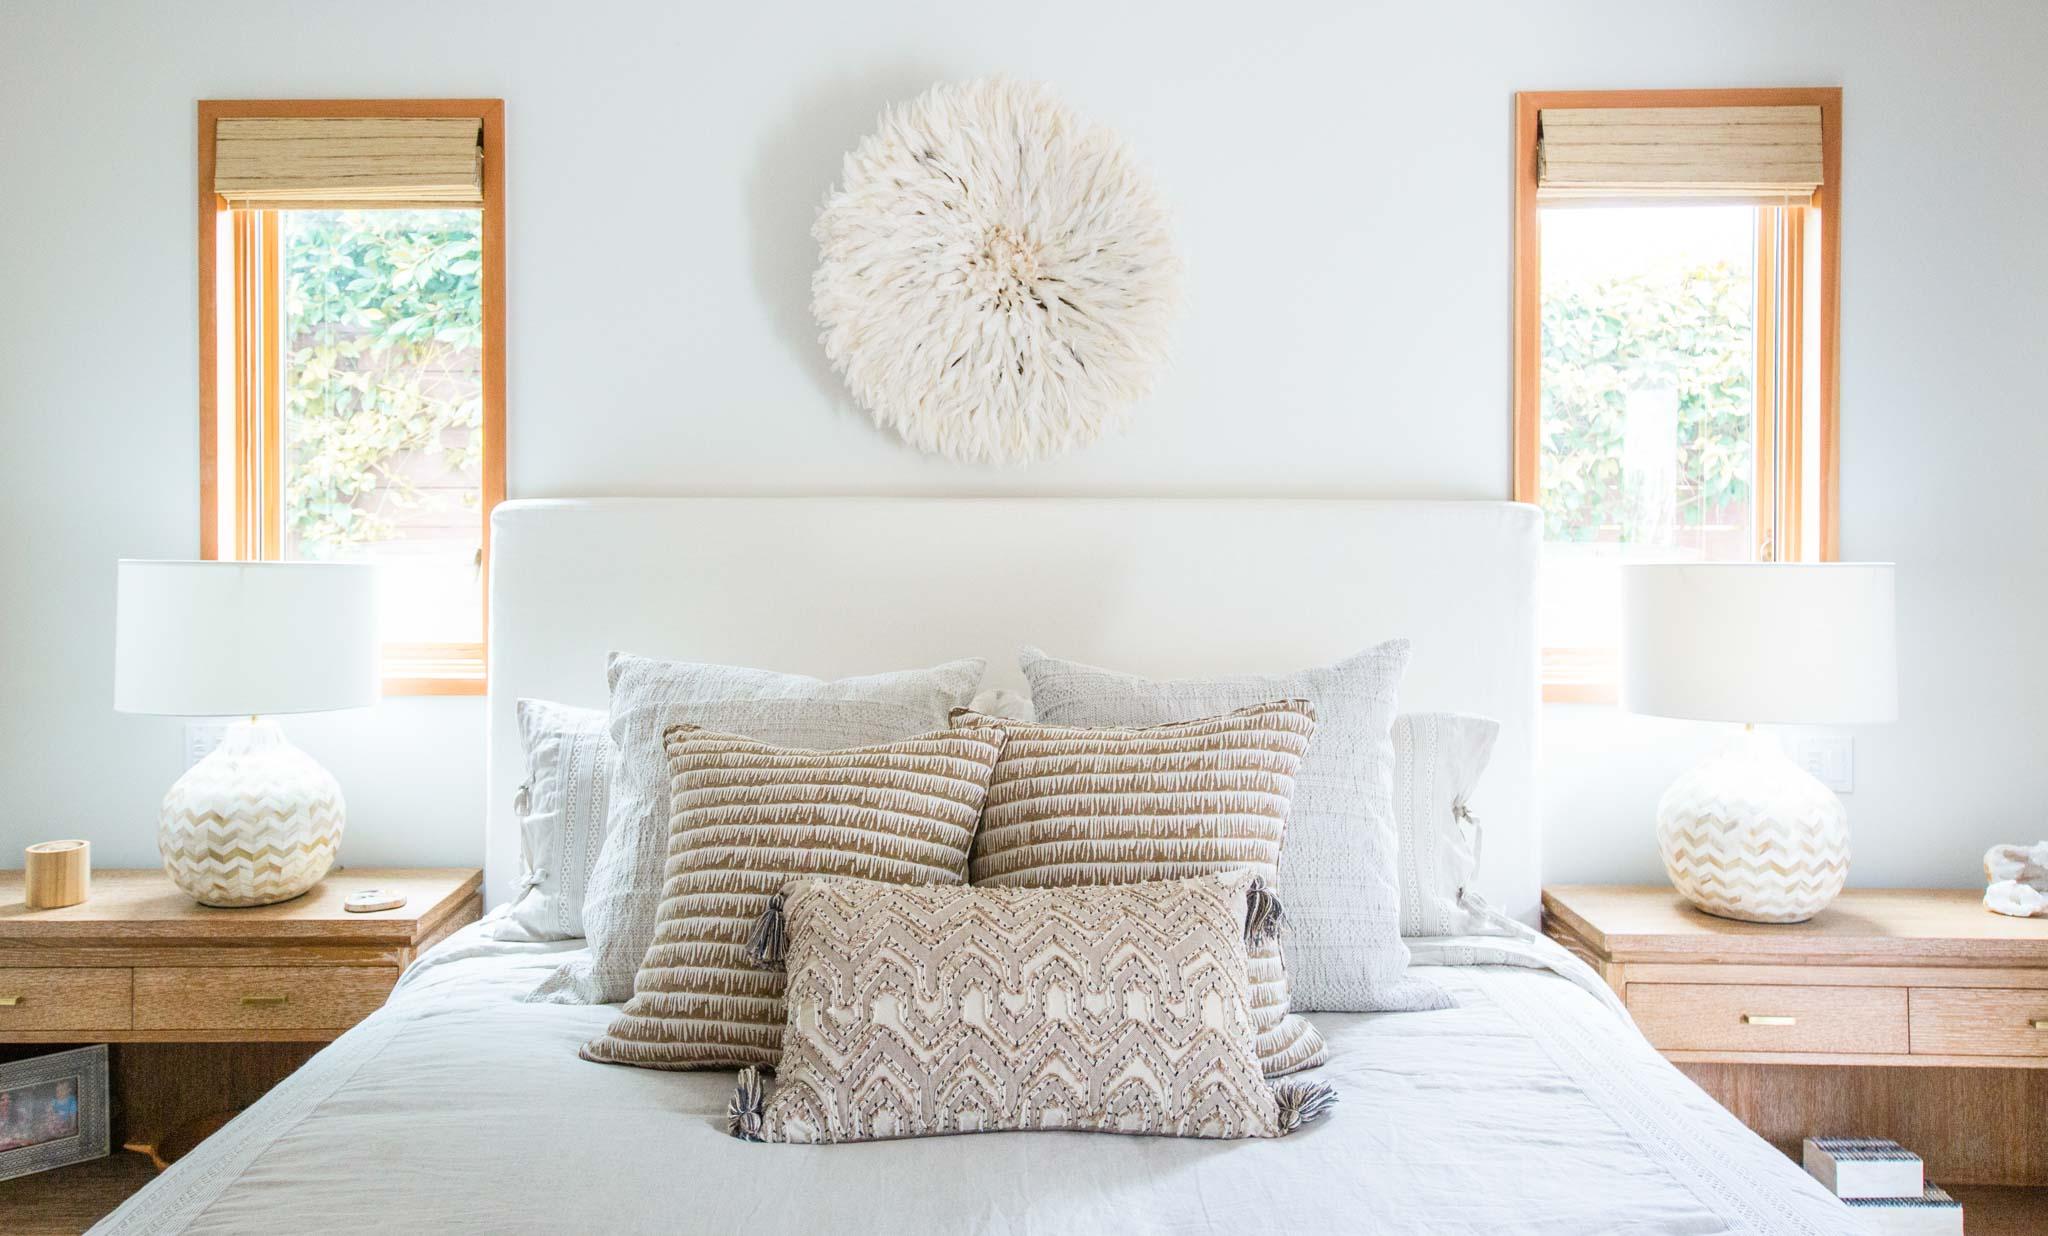 Jodi G Designs | Santa Barbara Interior Design Lanscape -37.jpg